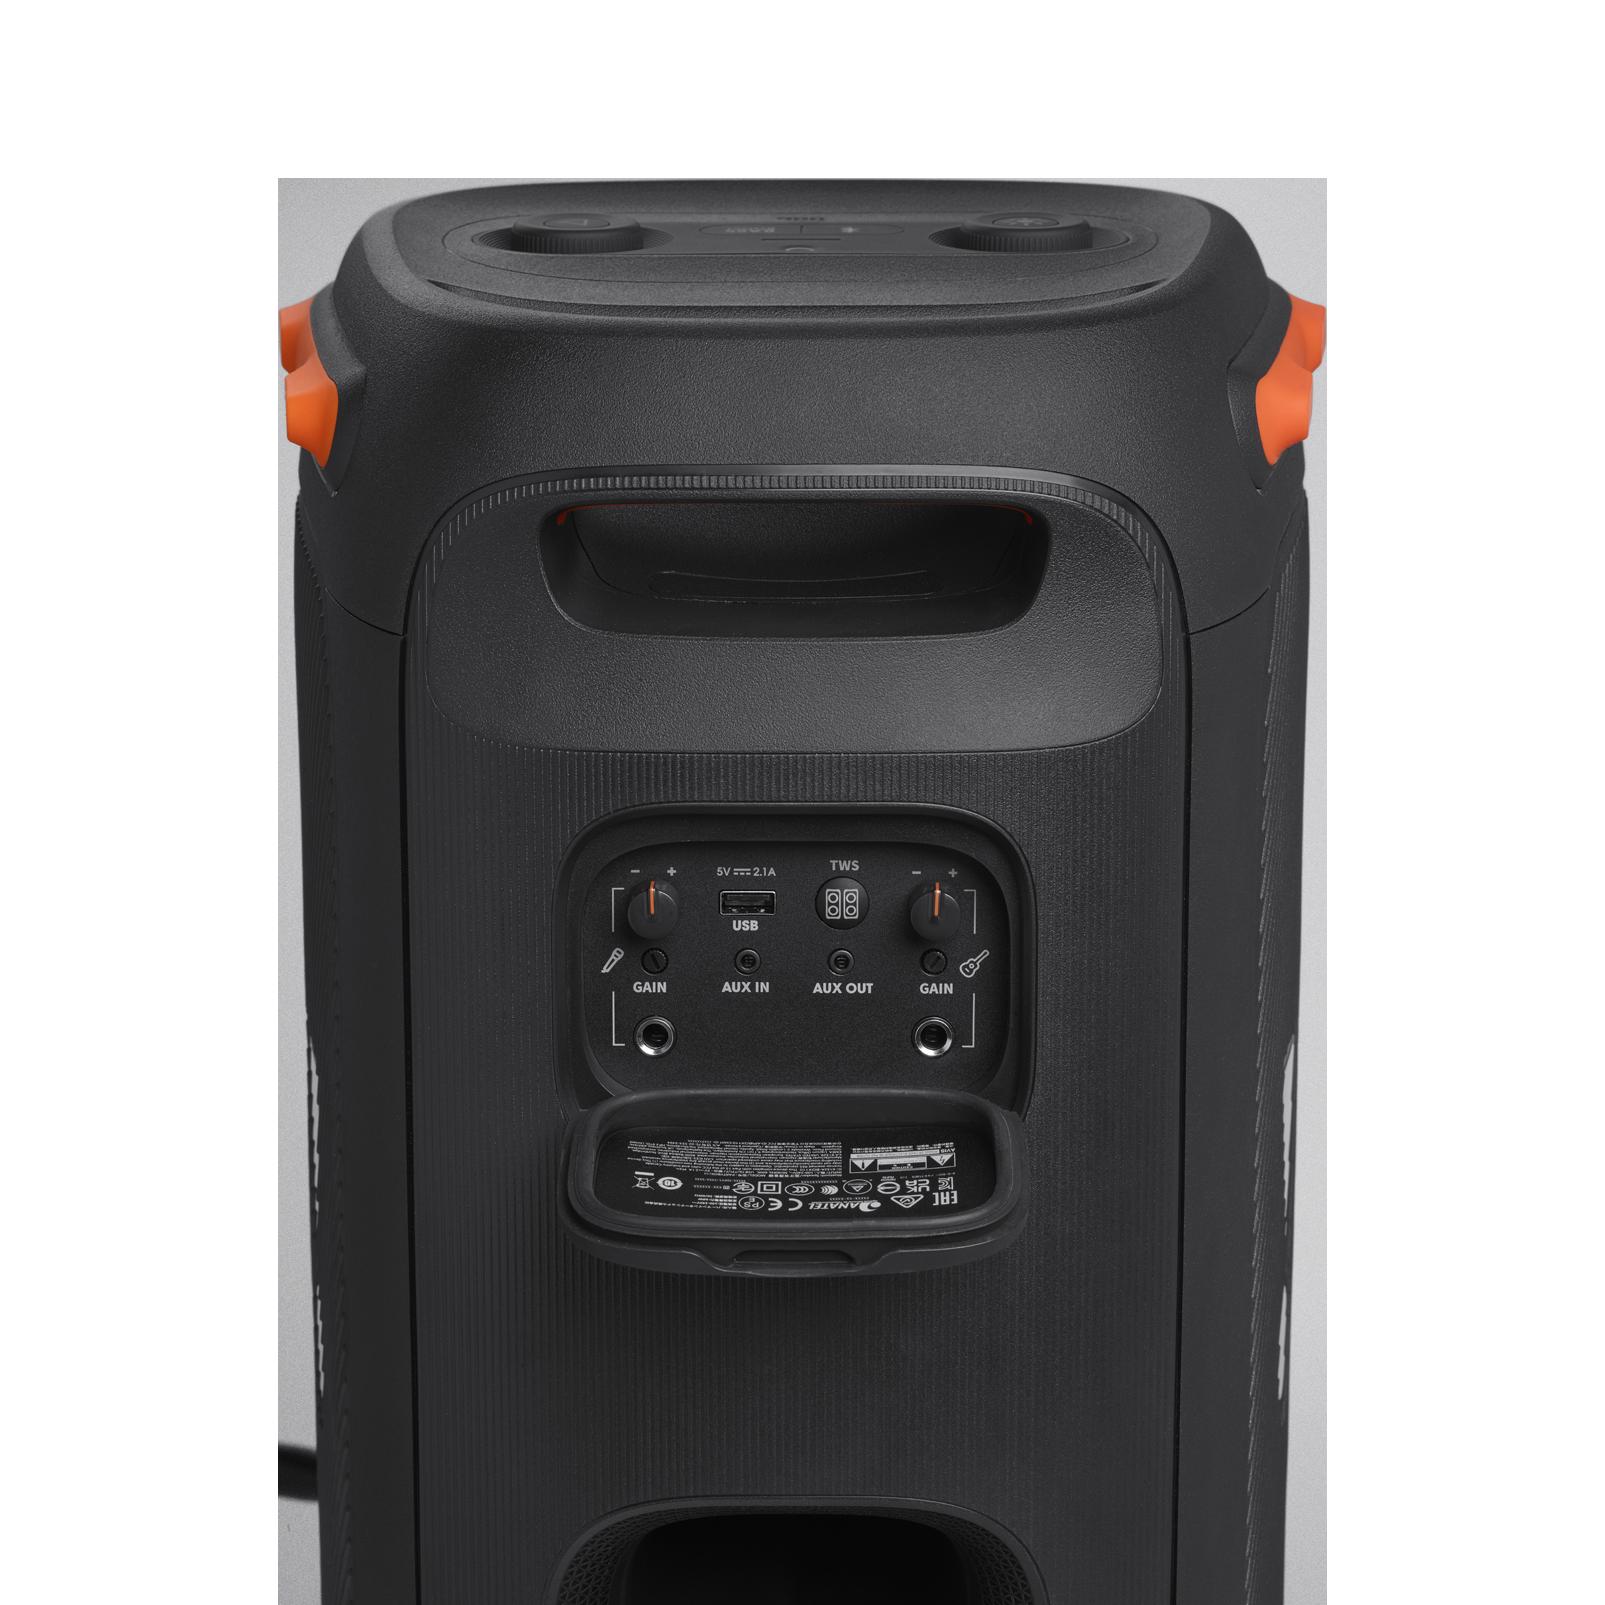 JBL Partybox 110 - Black - Portable party speaker with 160W powerful sound, built-in lights and splashproof design. - Detailshot 4